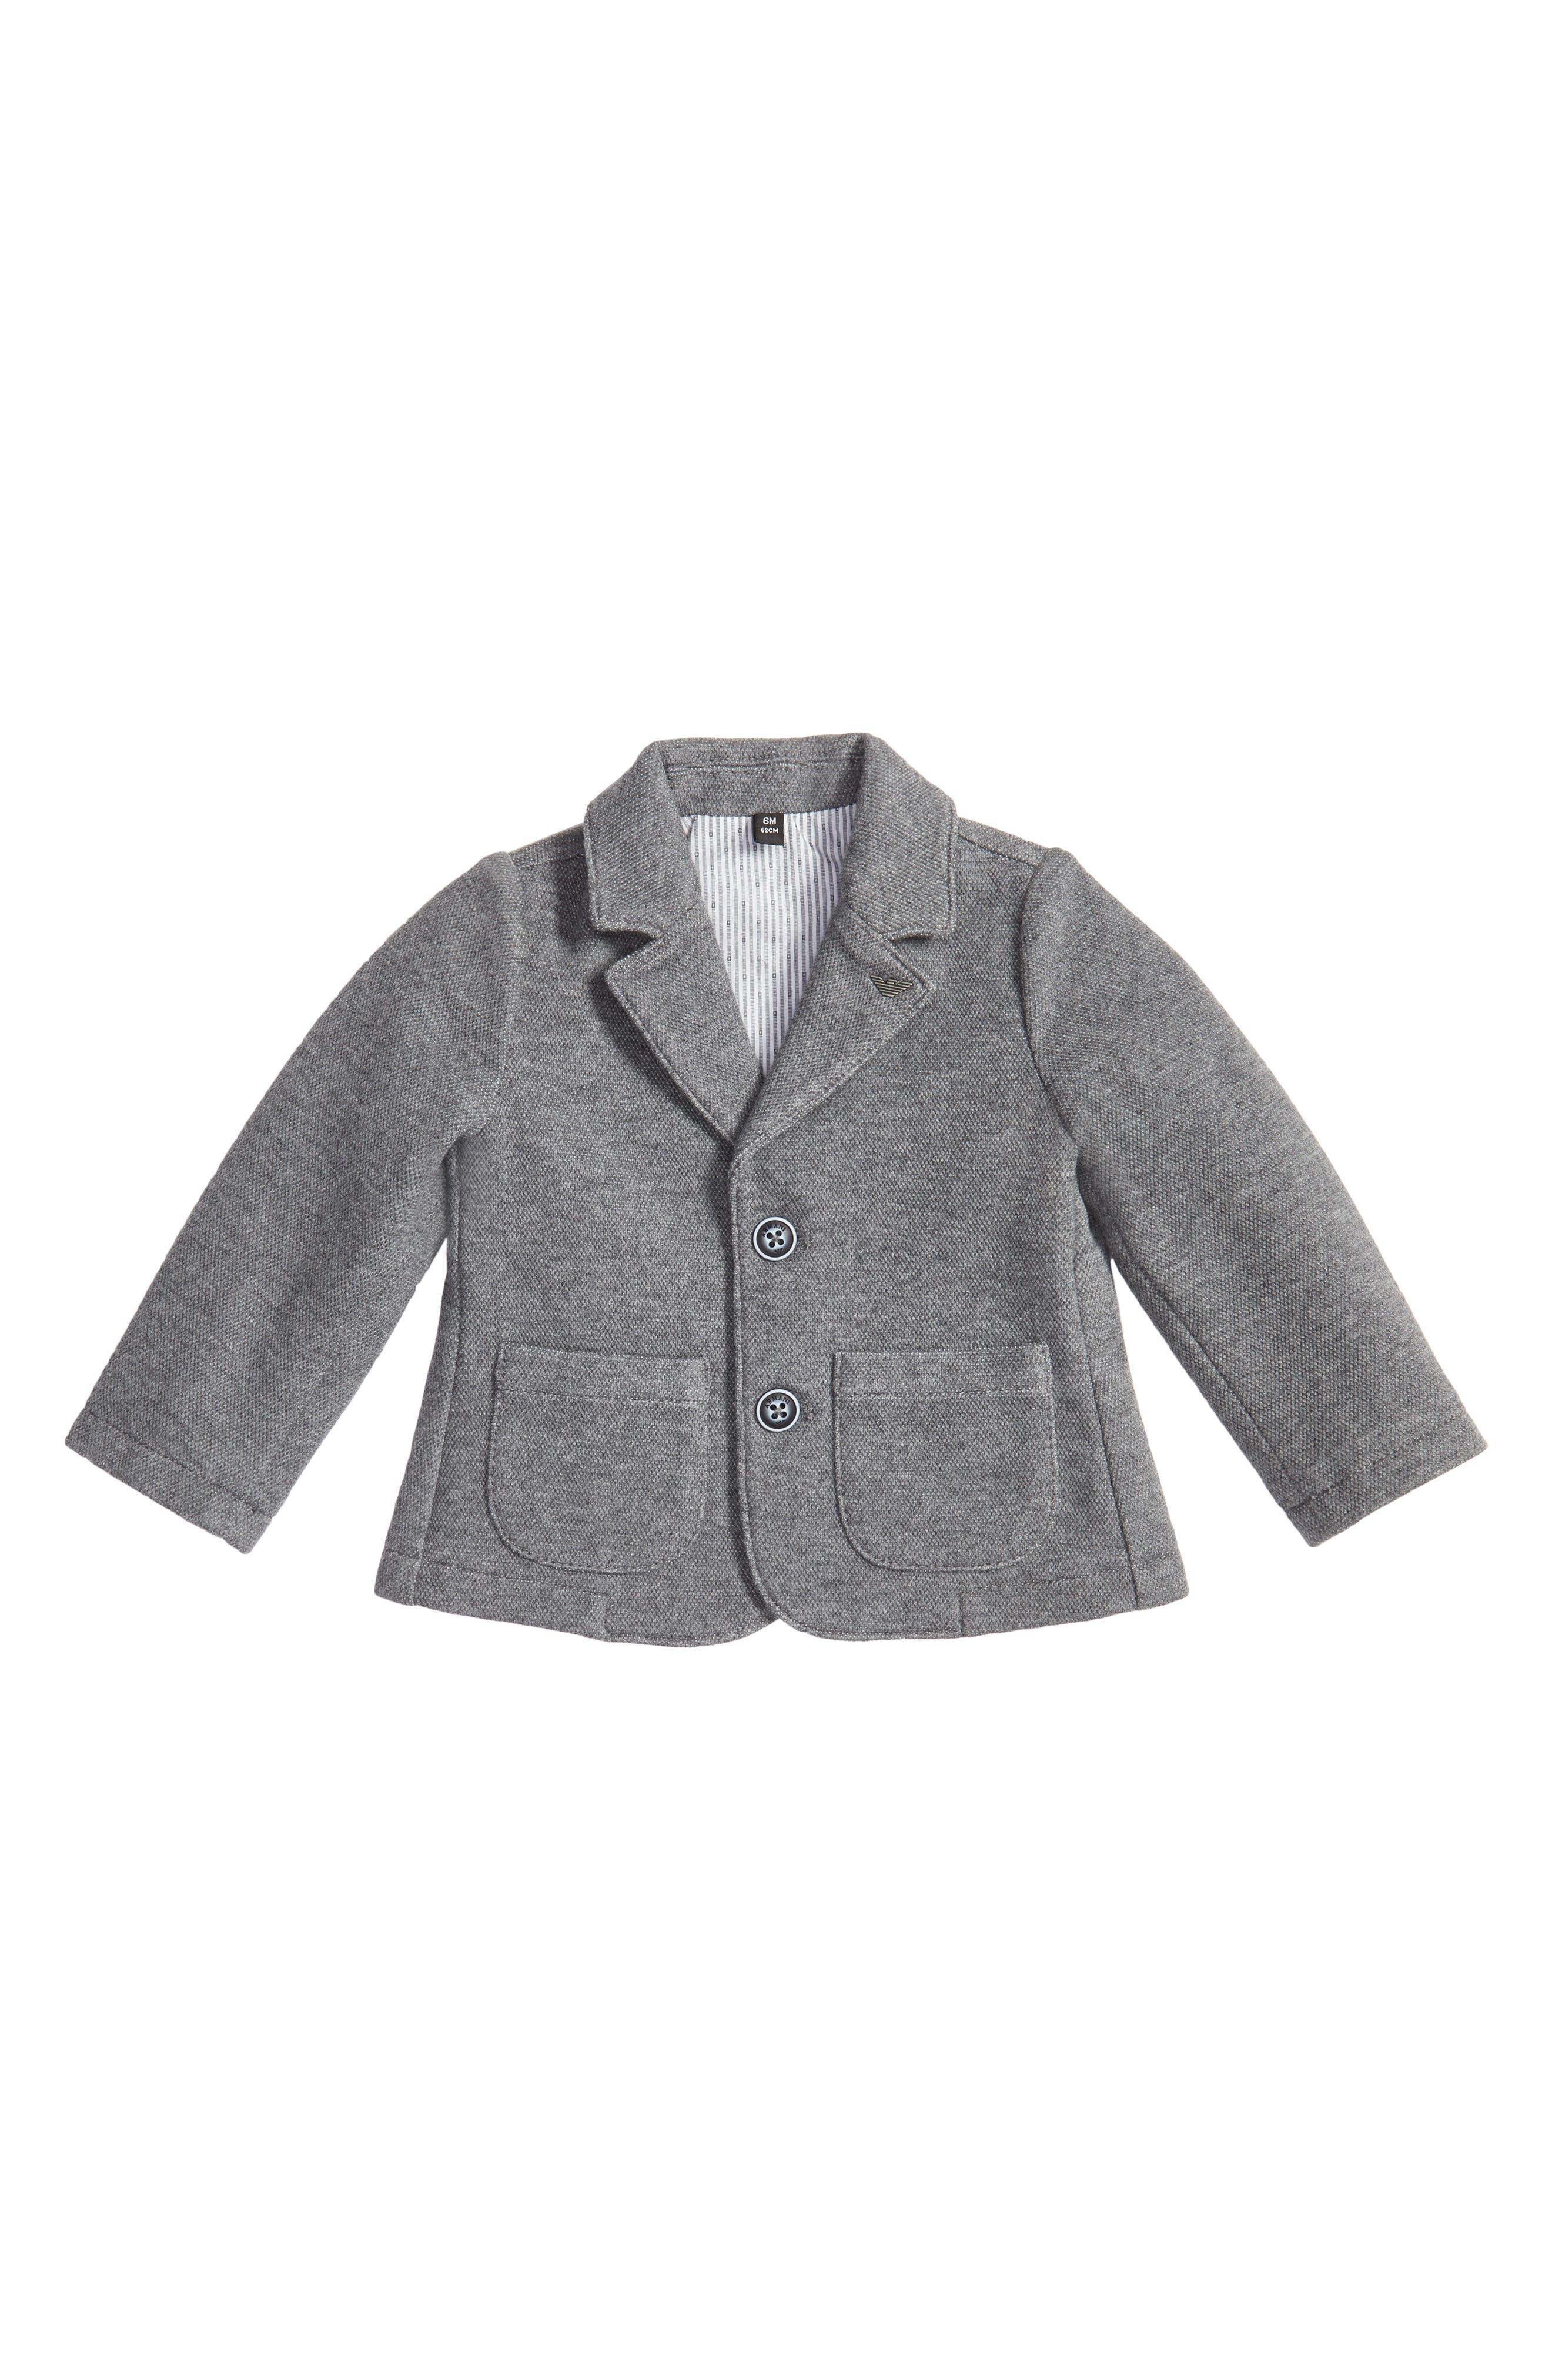 Main Image - Armani Junior Piqué Knit Blazer (Baby Boys)